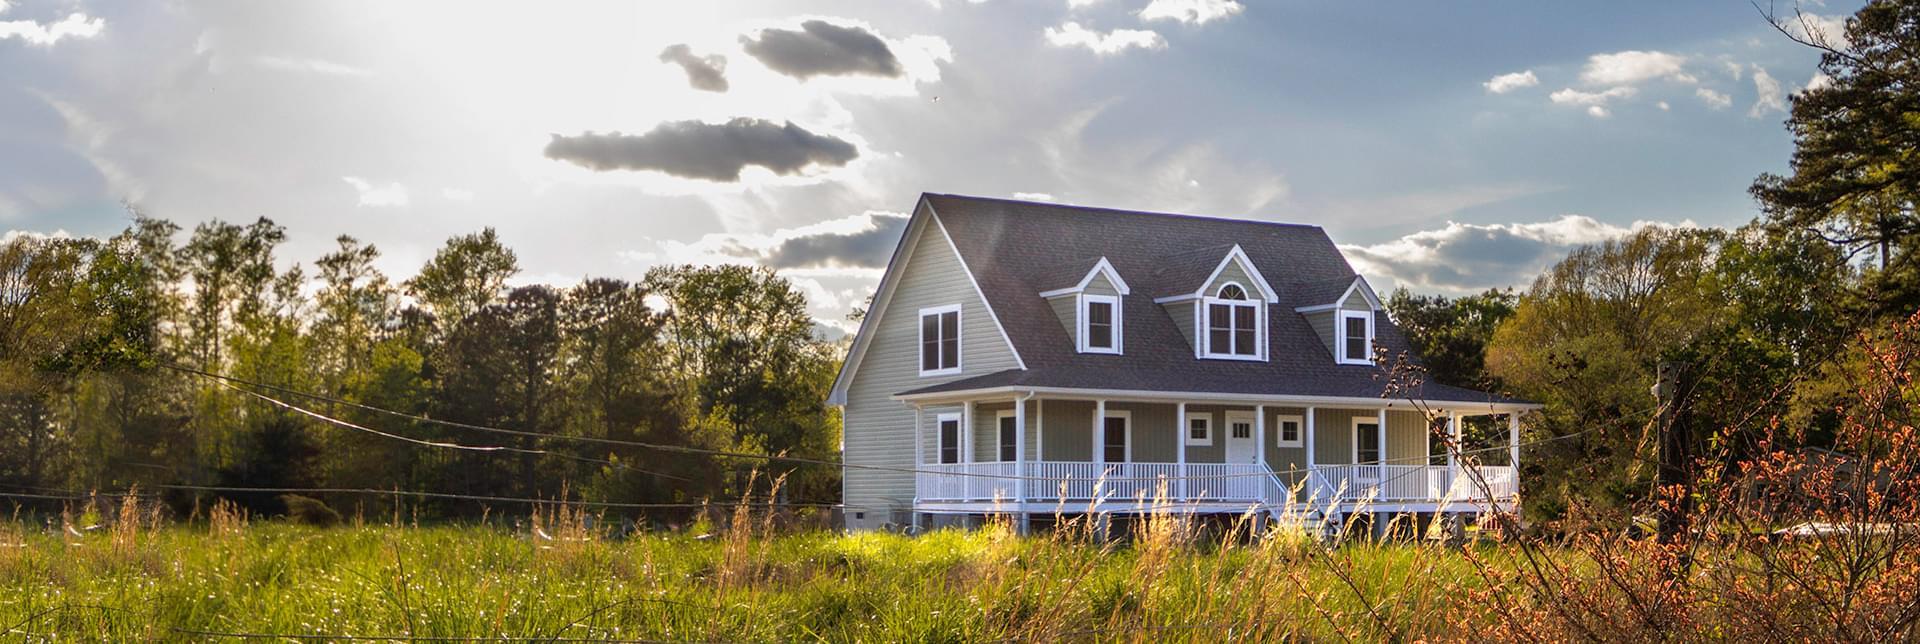 New Homes in Albemarle County VA